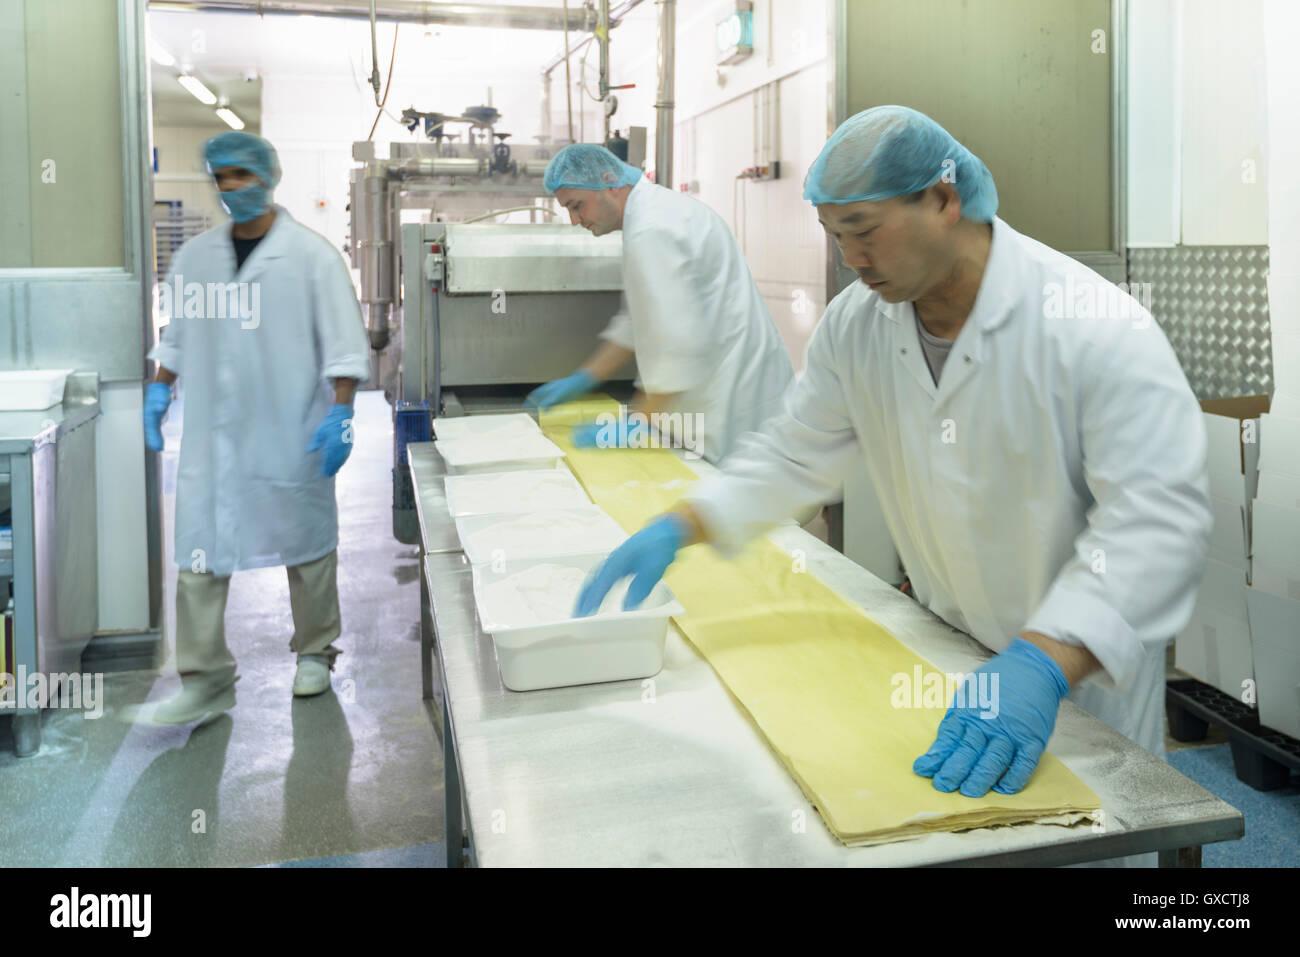 Workers making fresh pasta sheet in pasta factory - Stock Image